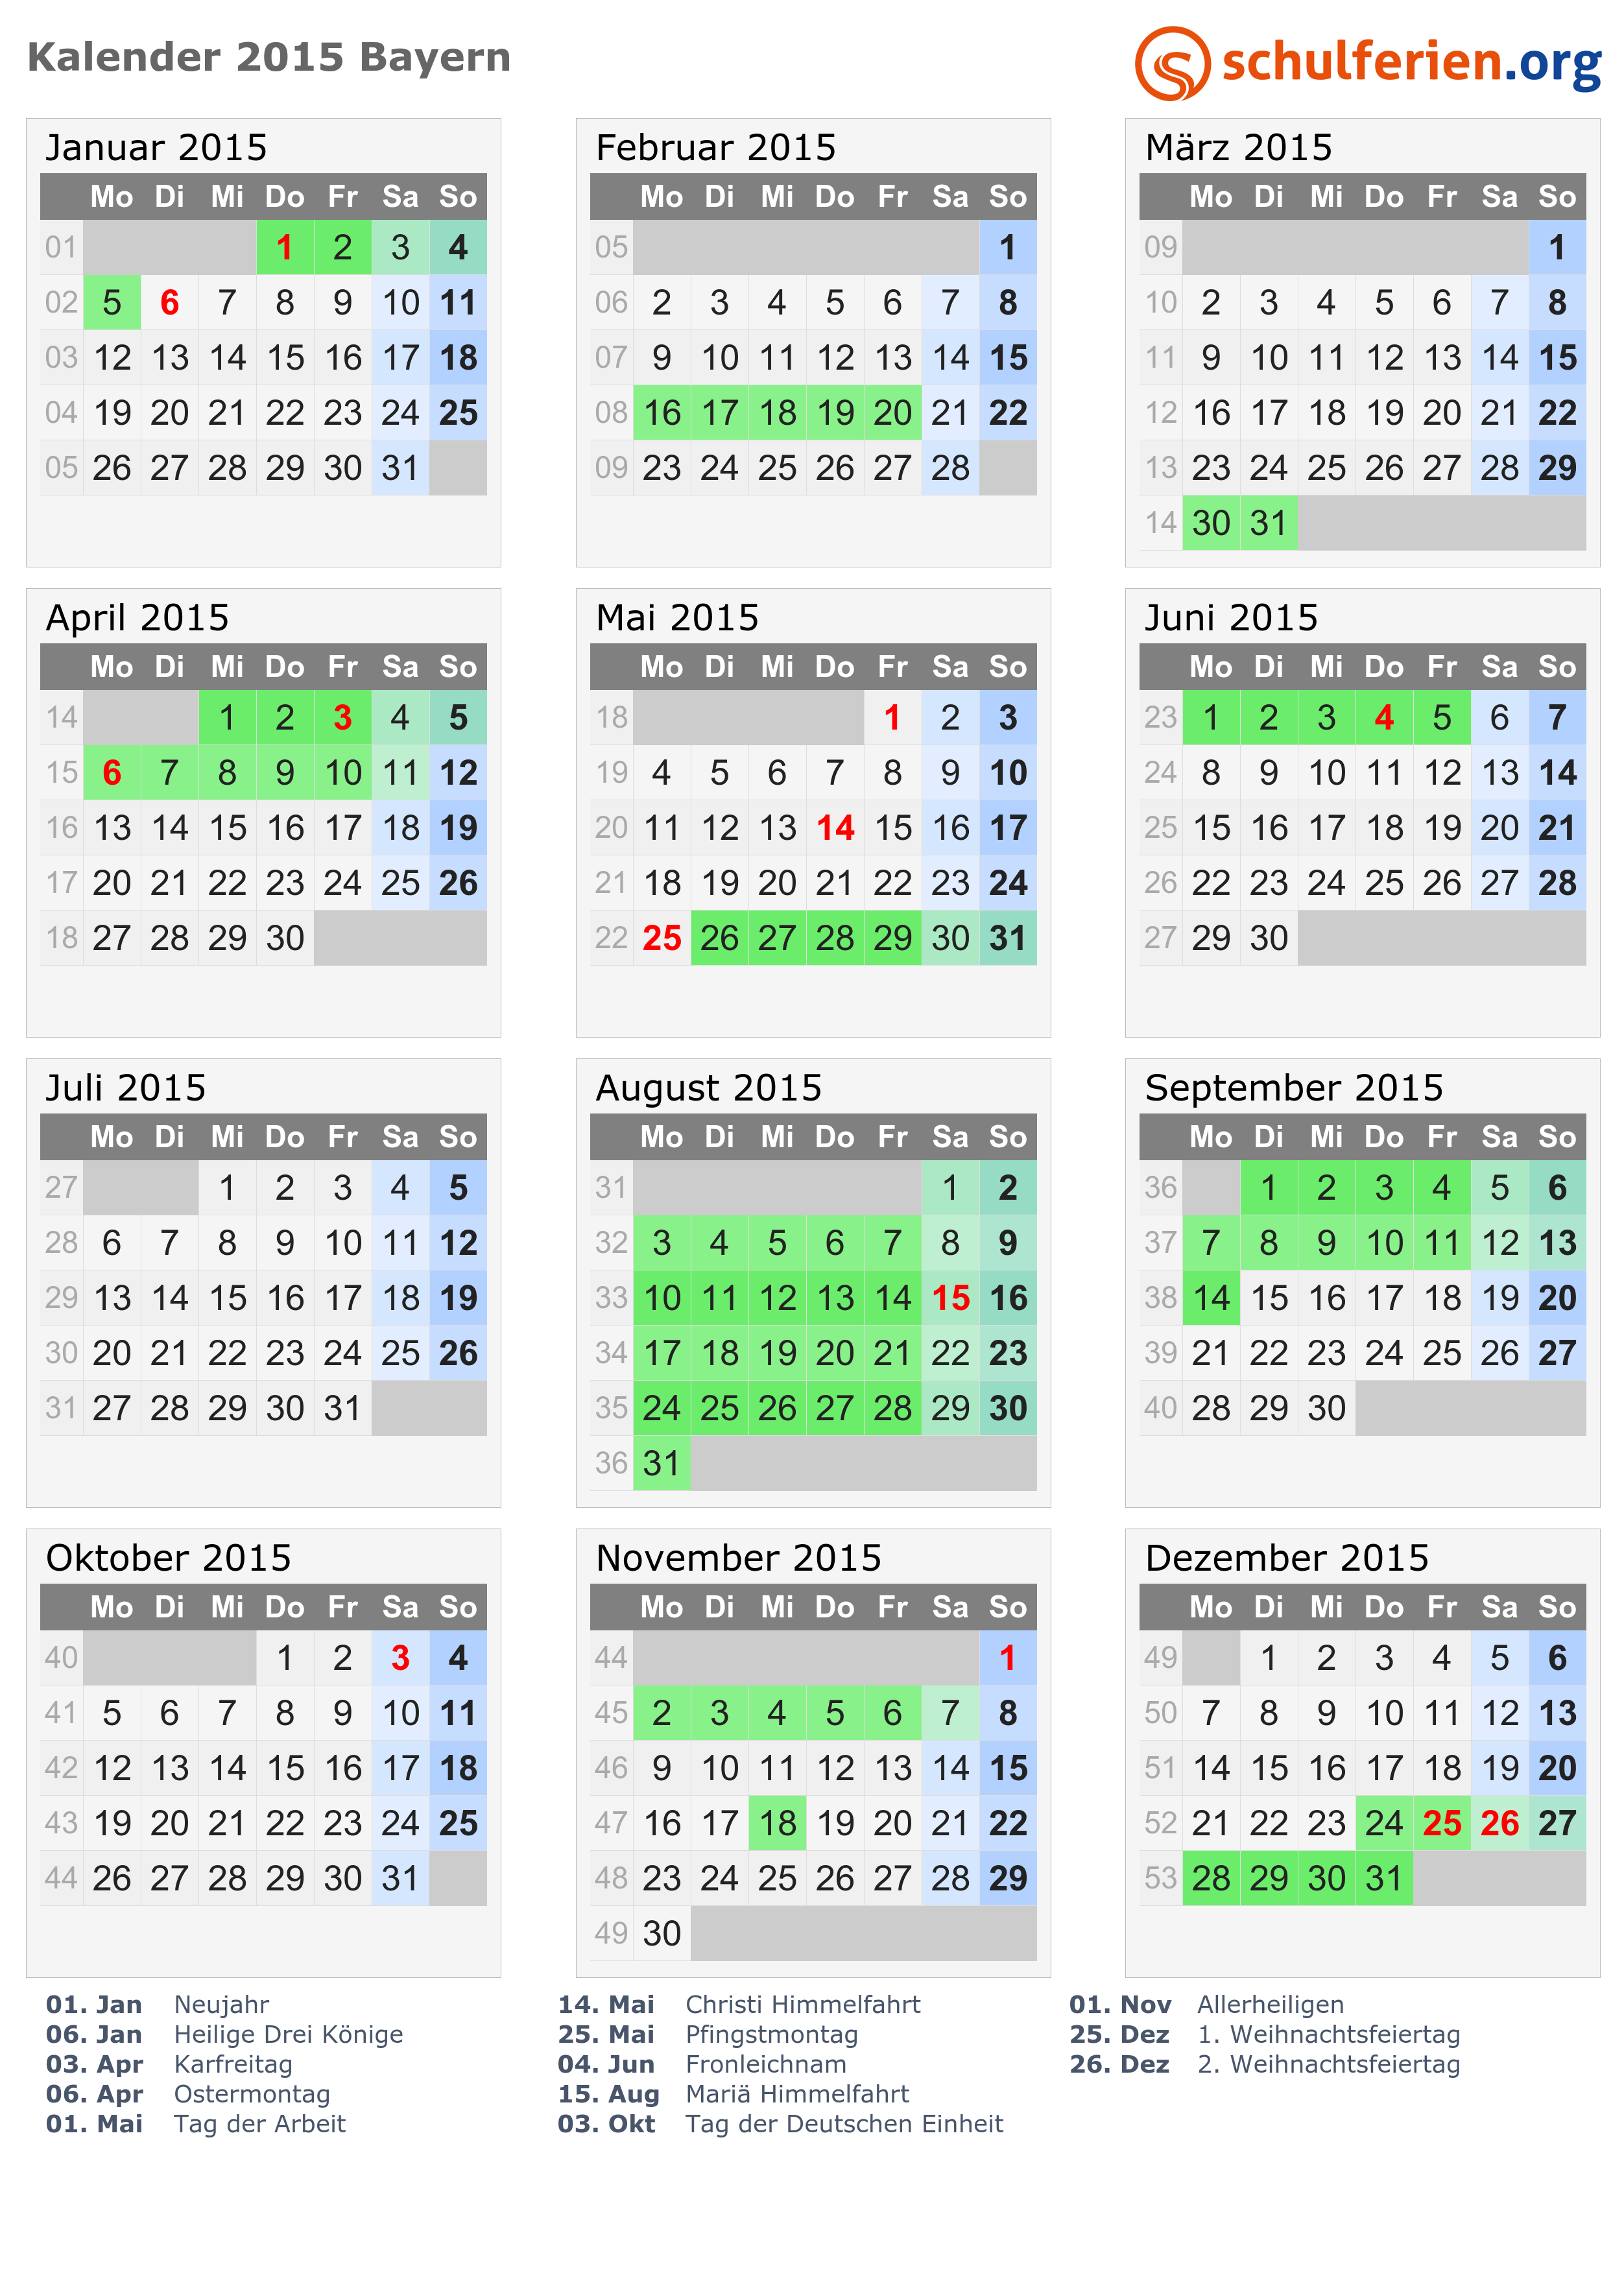 kalender 2015 ferien bayern feiertage. Black Bedroom Furniture Sets. Home Design Ideas